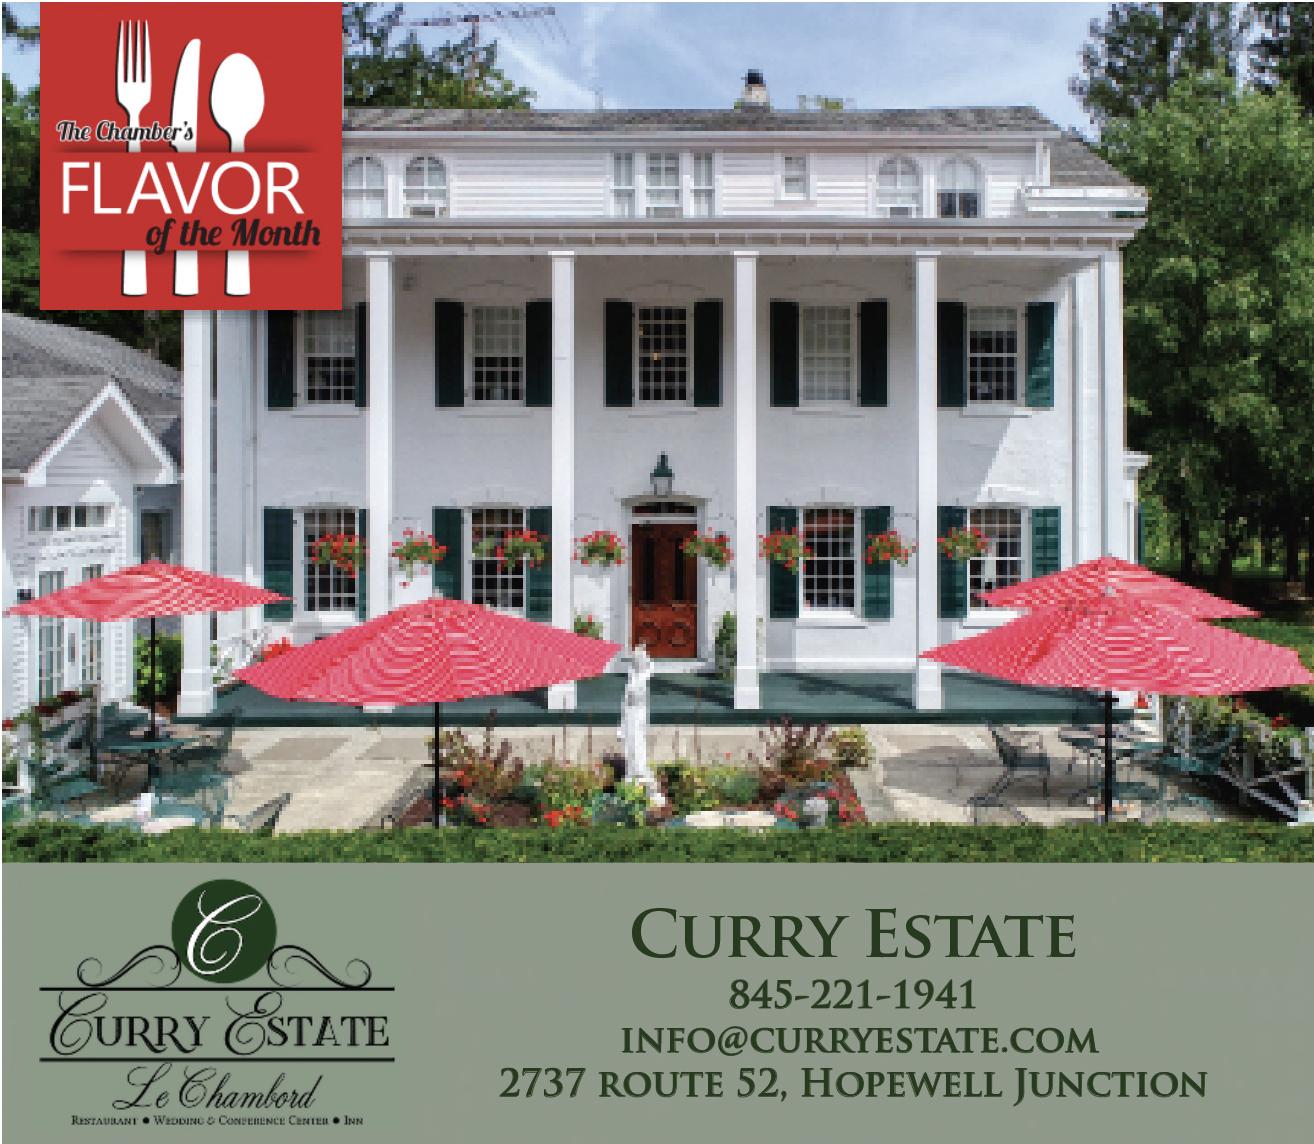 Curry Estate